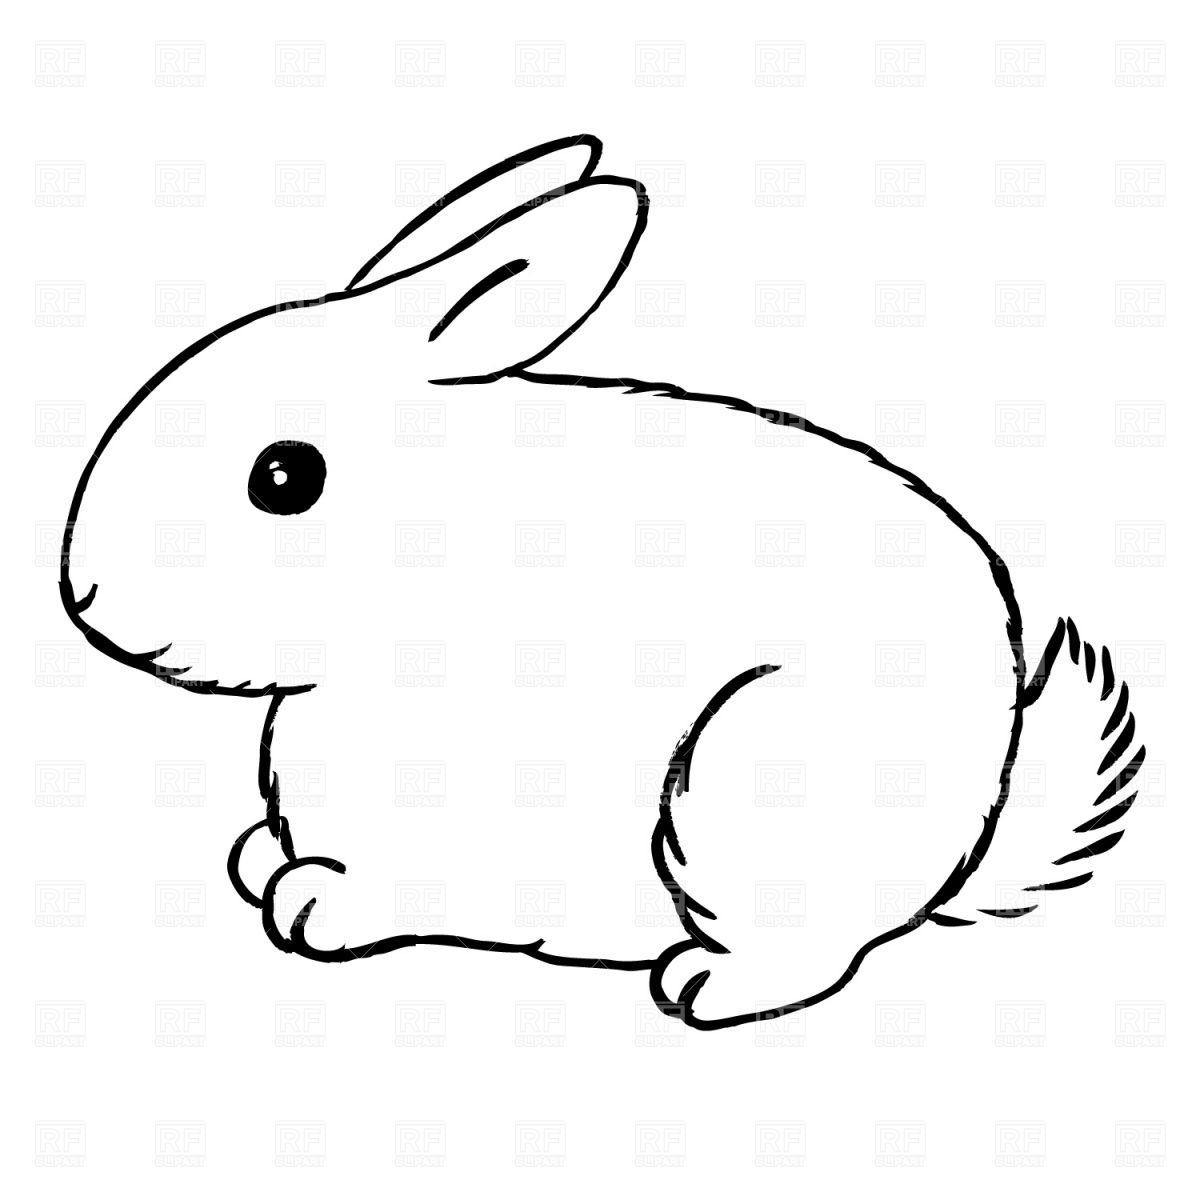 drawings of rabbits and bunnies.